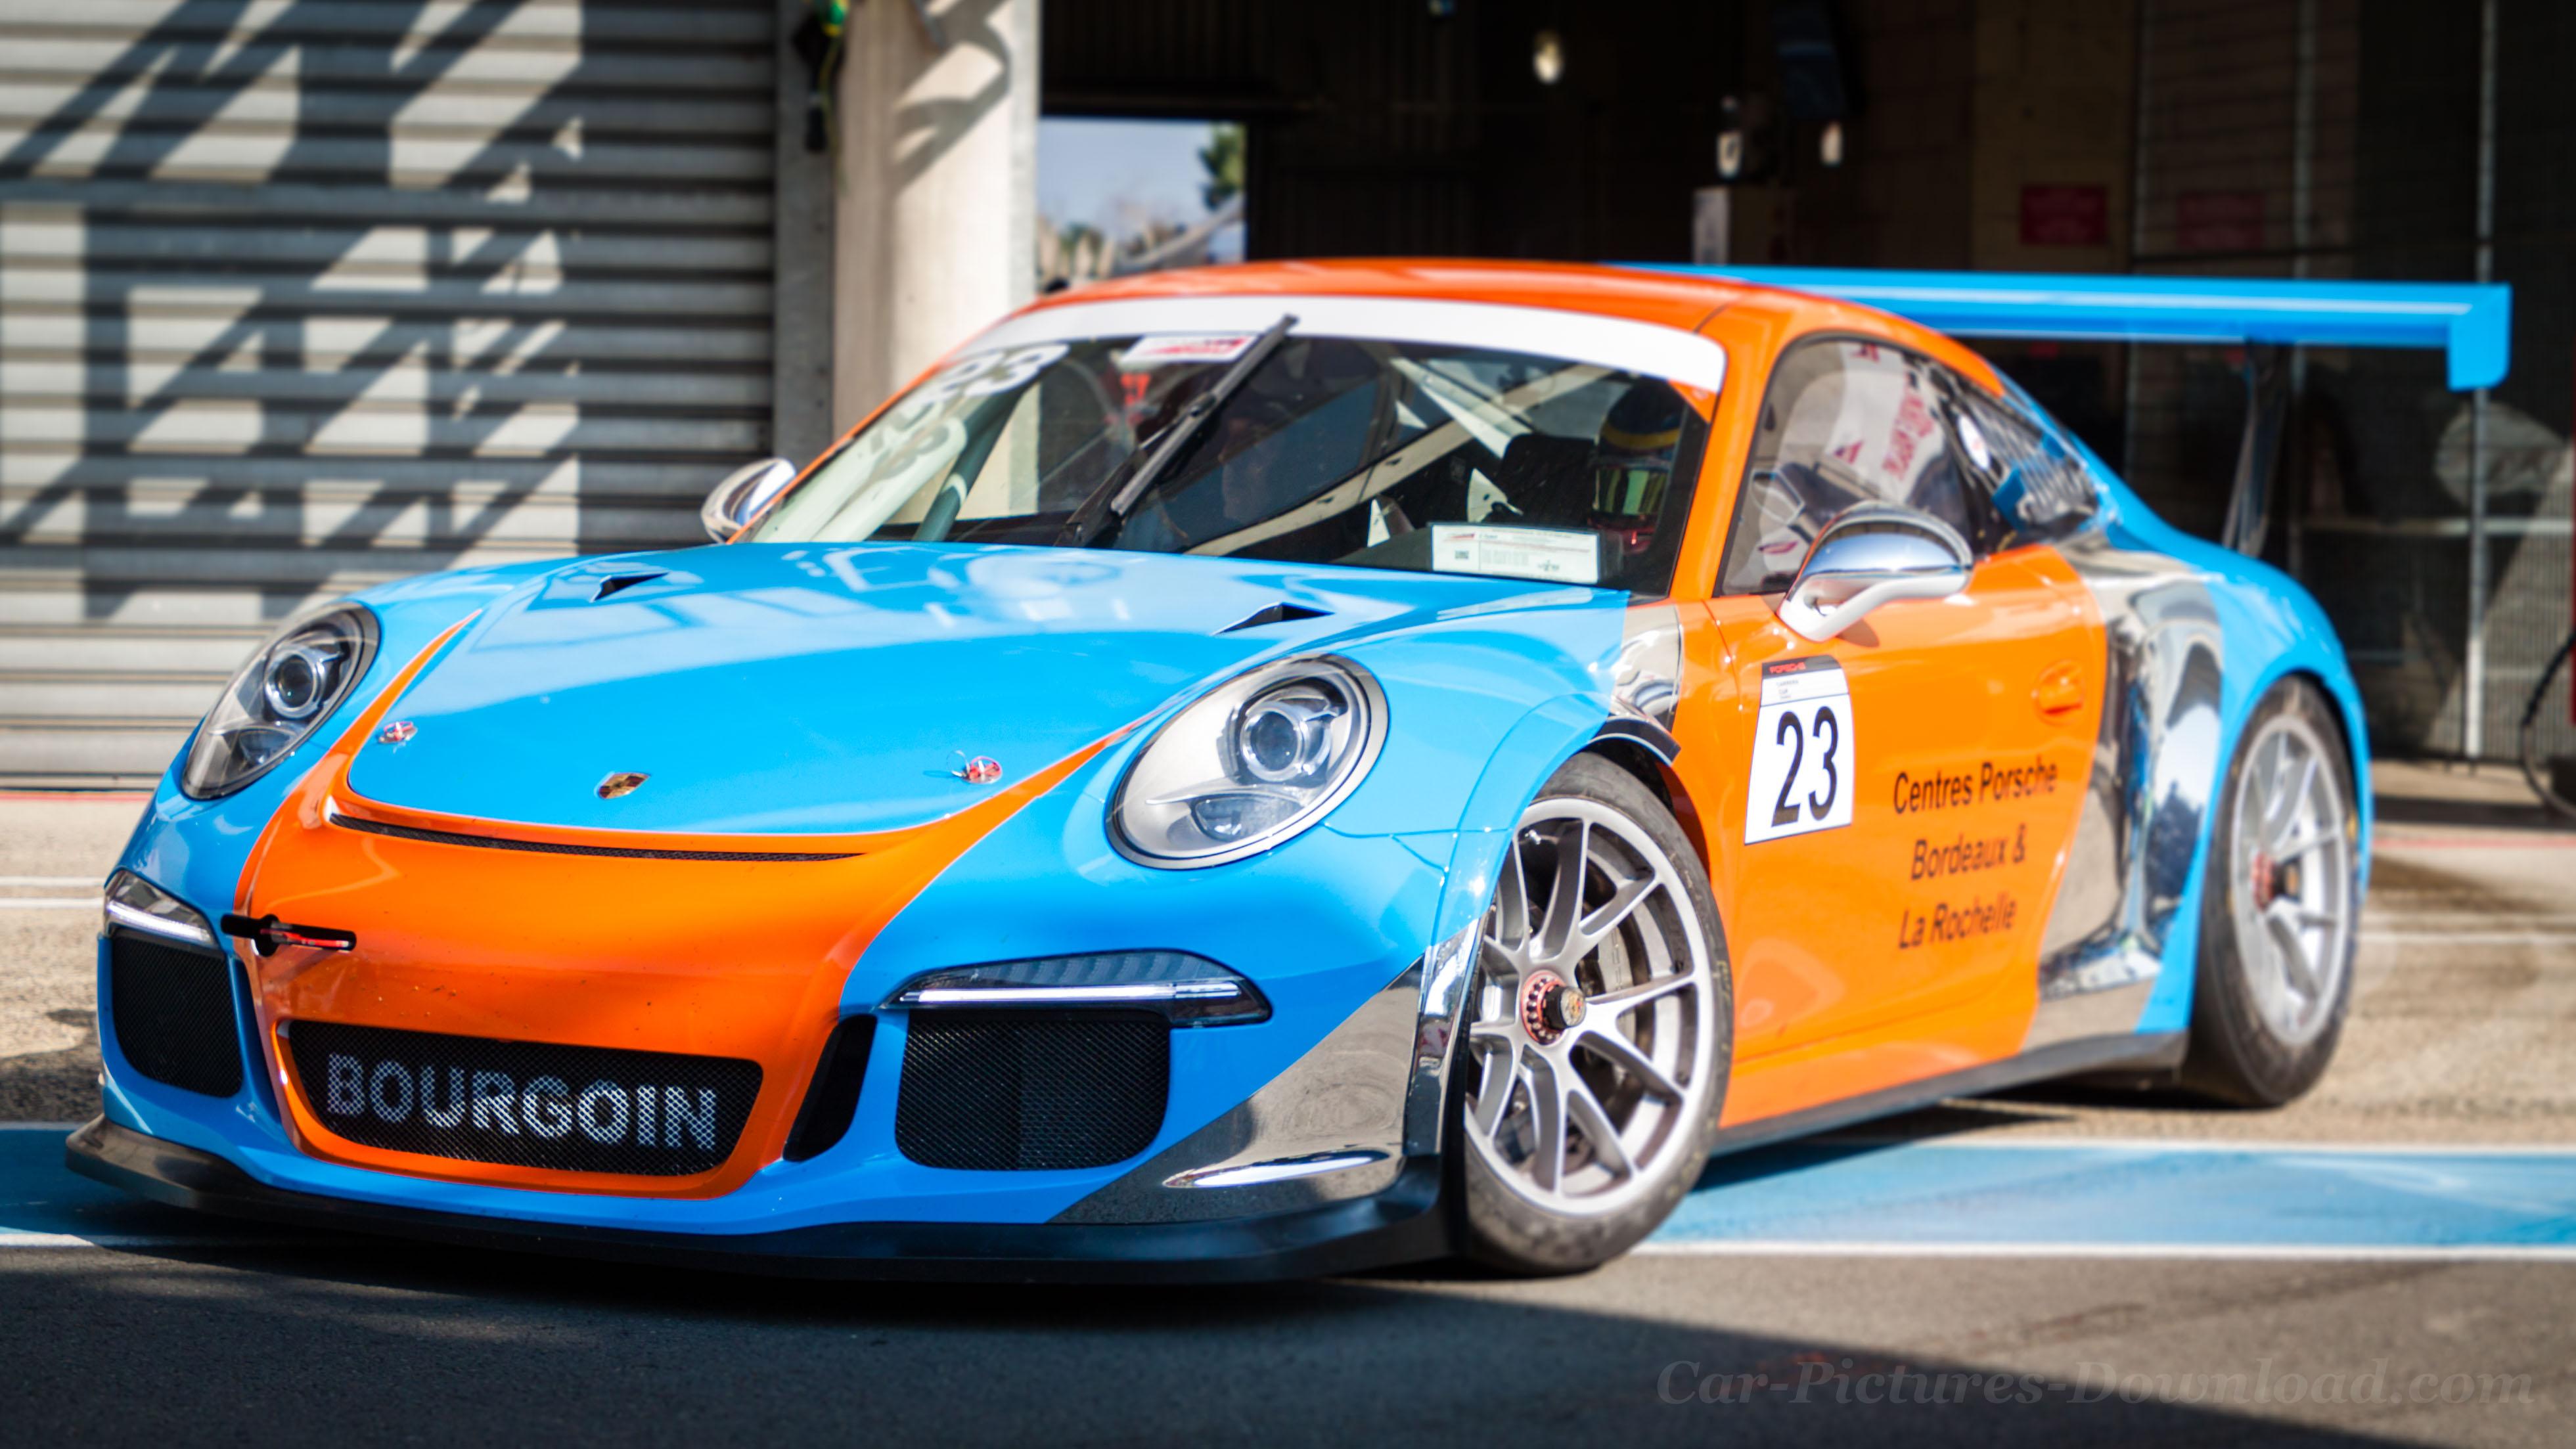 Porsche Wallpaper Images   4K Ultra HD Mobile PC   Download 3921x2206